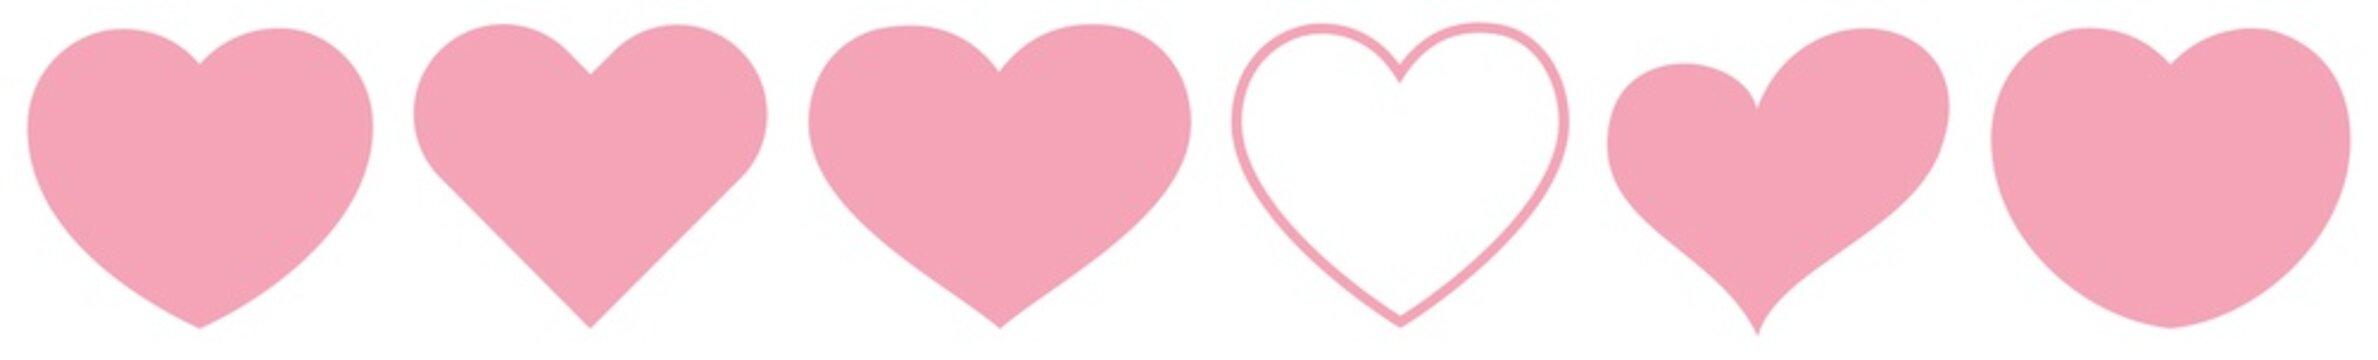 Heart Rose Pink   Love   Logo   Variations